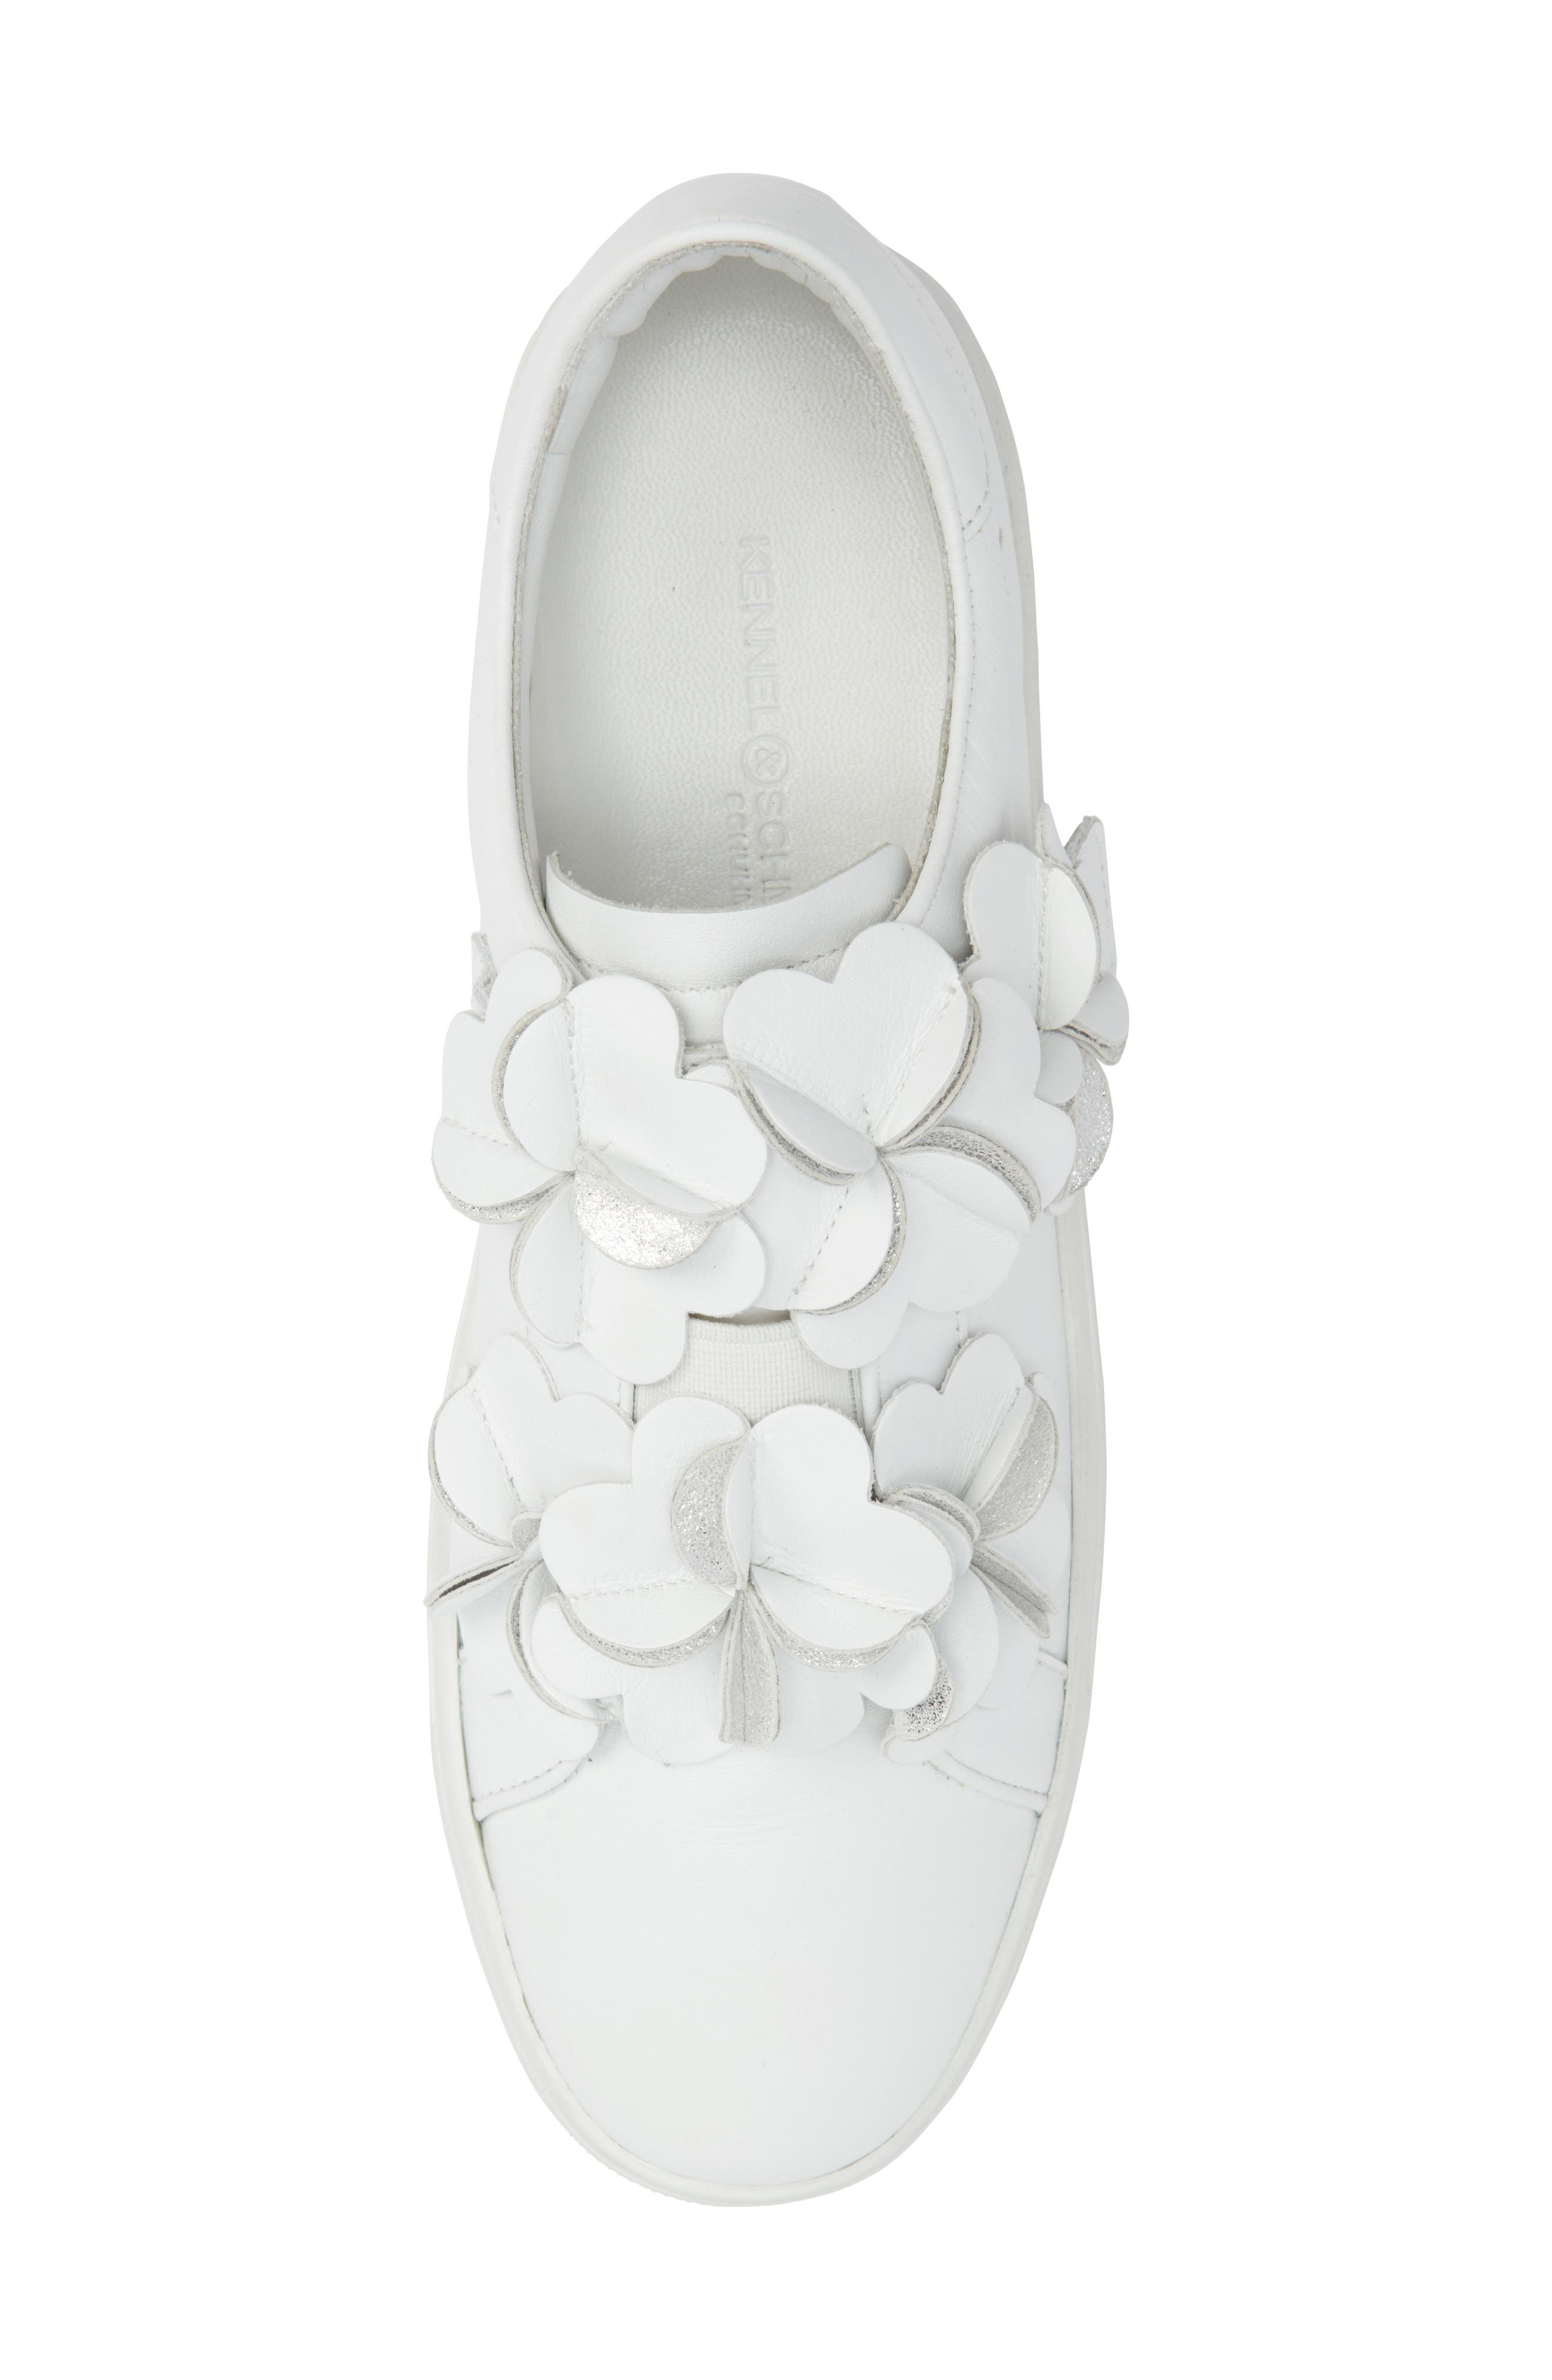 Kennel & Schmenger Town Floral Embellished Sneaker,                             Alternate thumbnail 5, color,                             White/ Silver